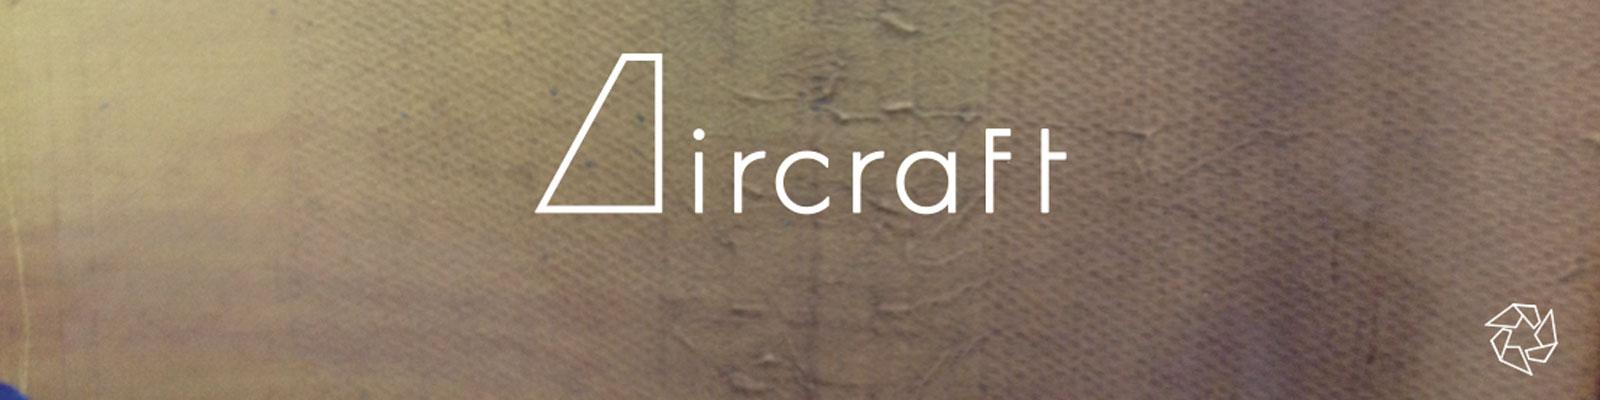 Kevin-McClouds-Machanibals_branding